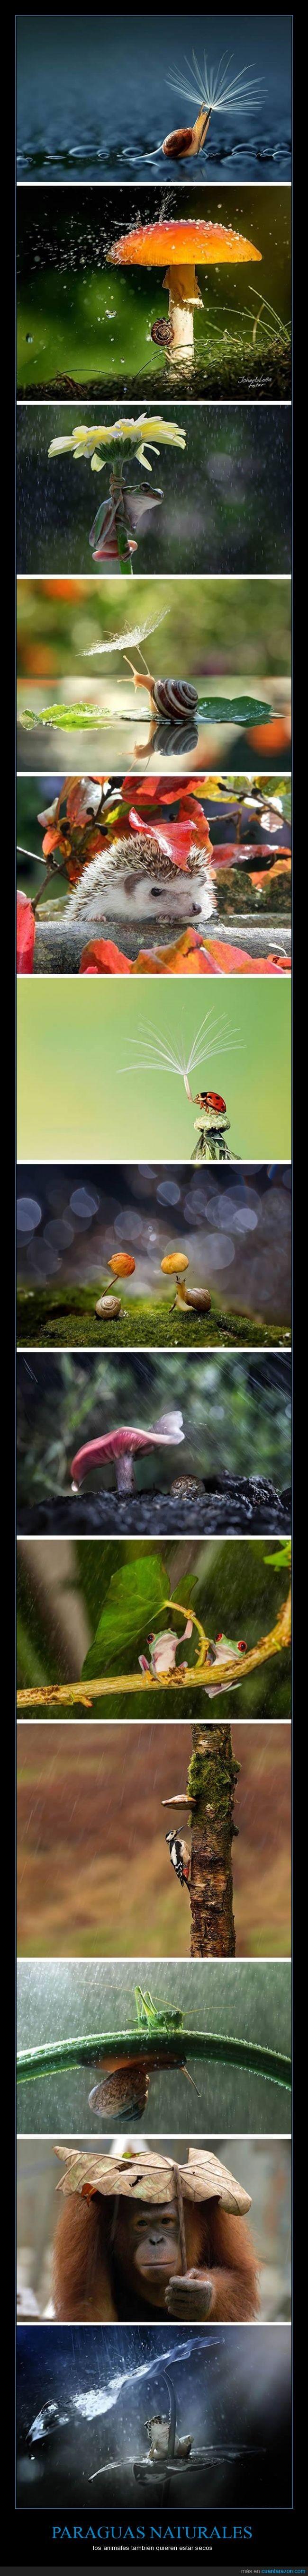 agua,animal,hoja,lluvia,natural,paraguas,rama,tapar